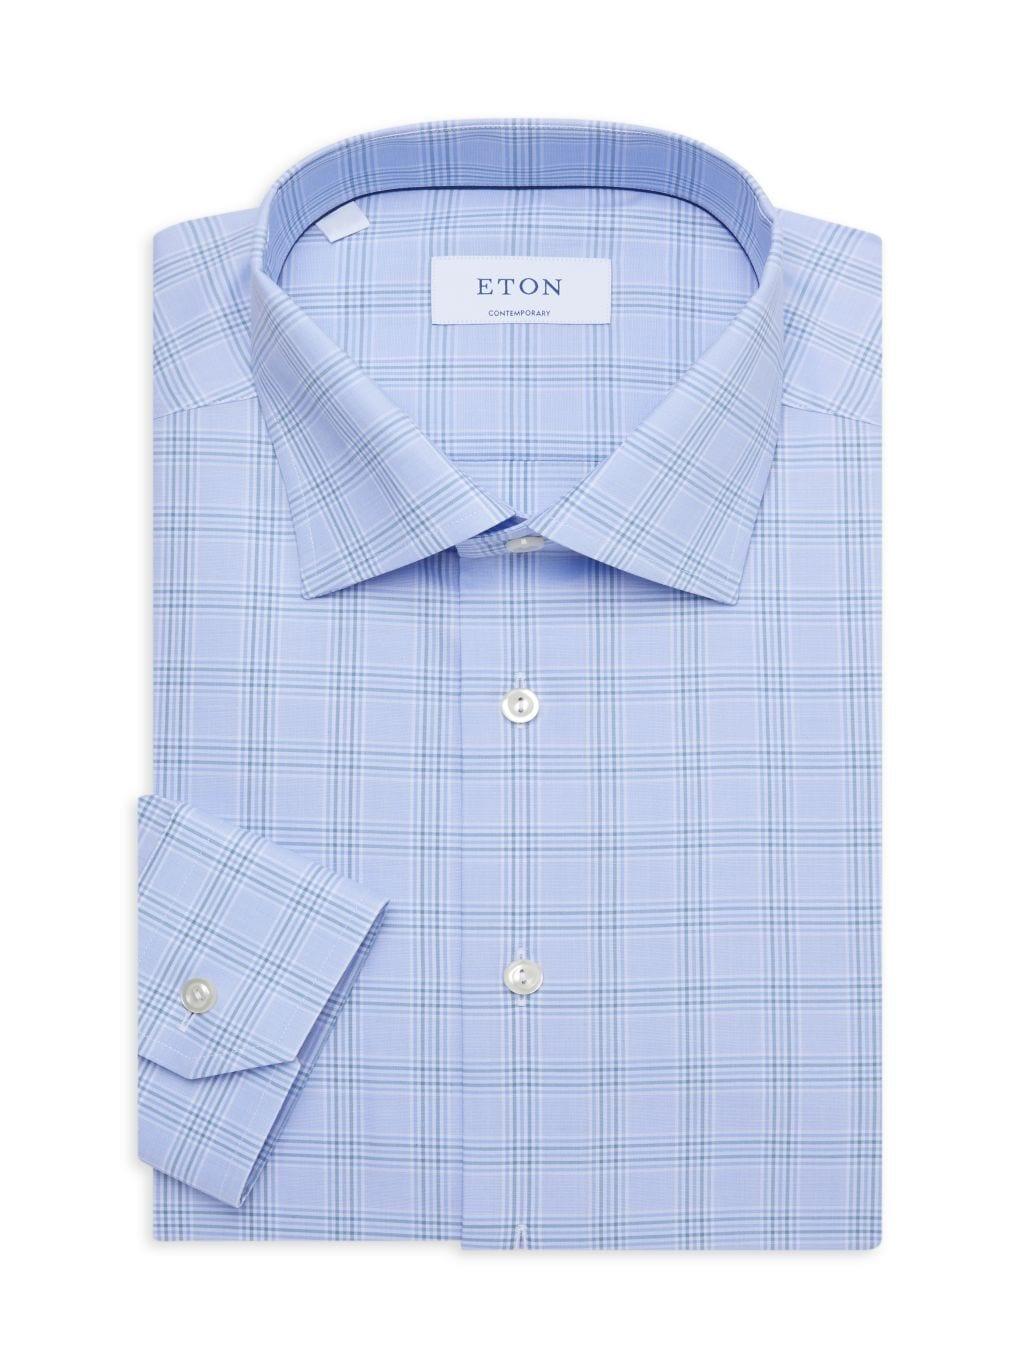 Eton Contemporary-Fit Plaid-Print Dress Shirt